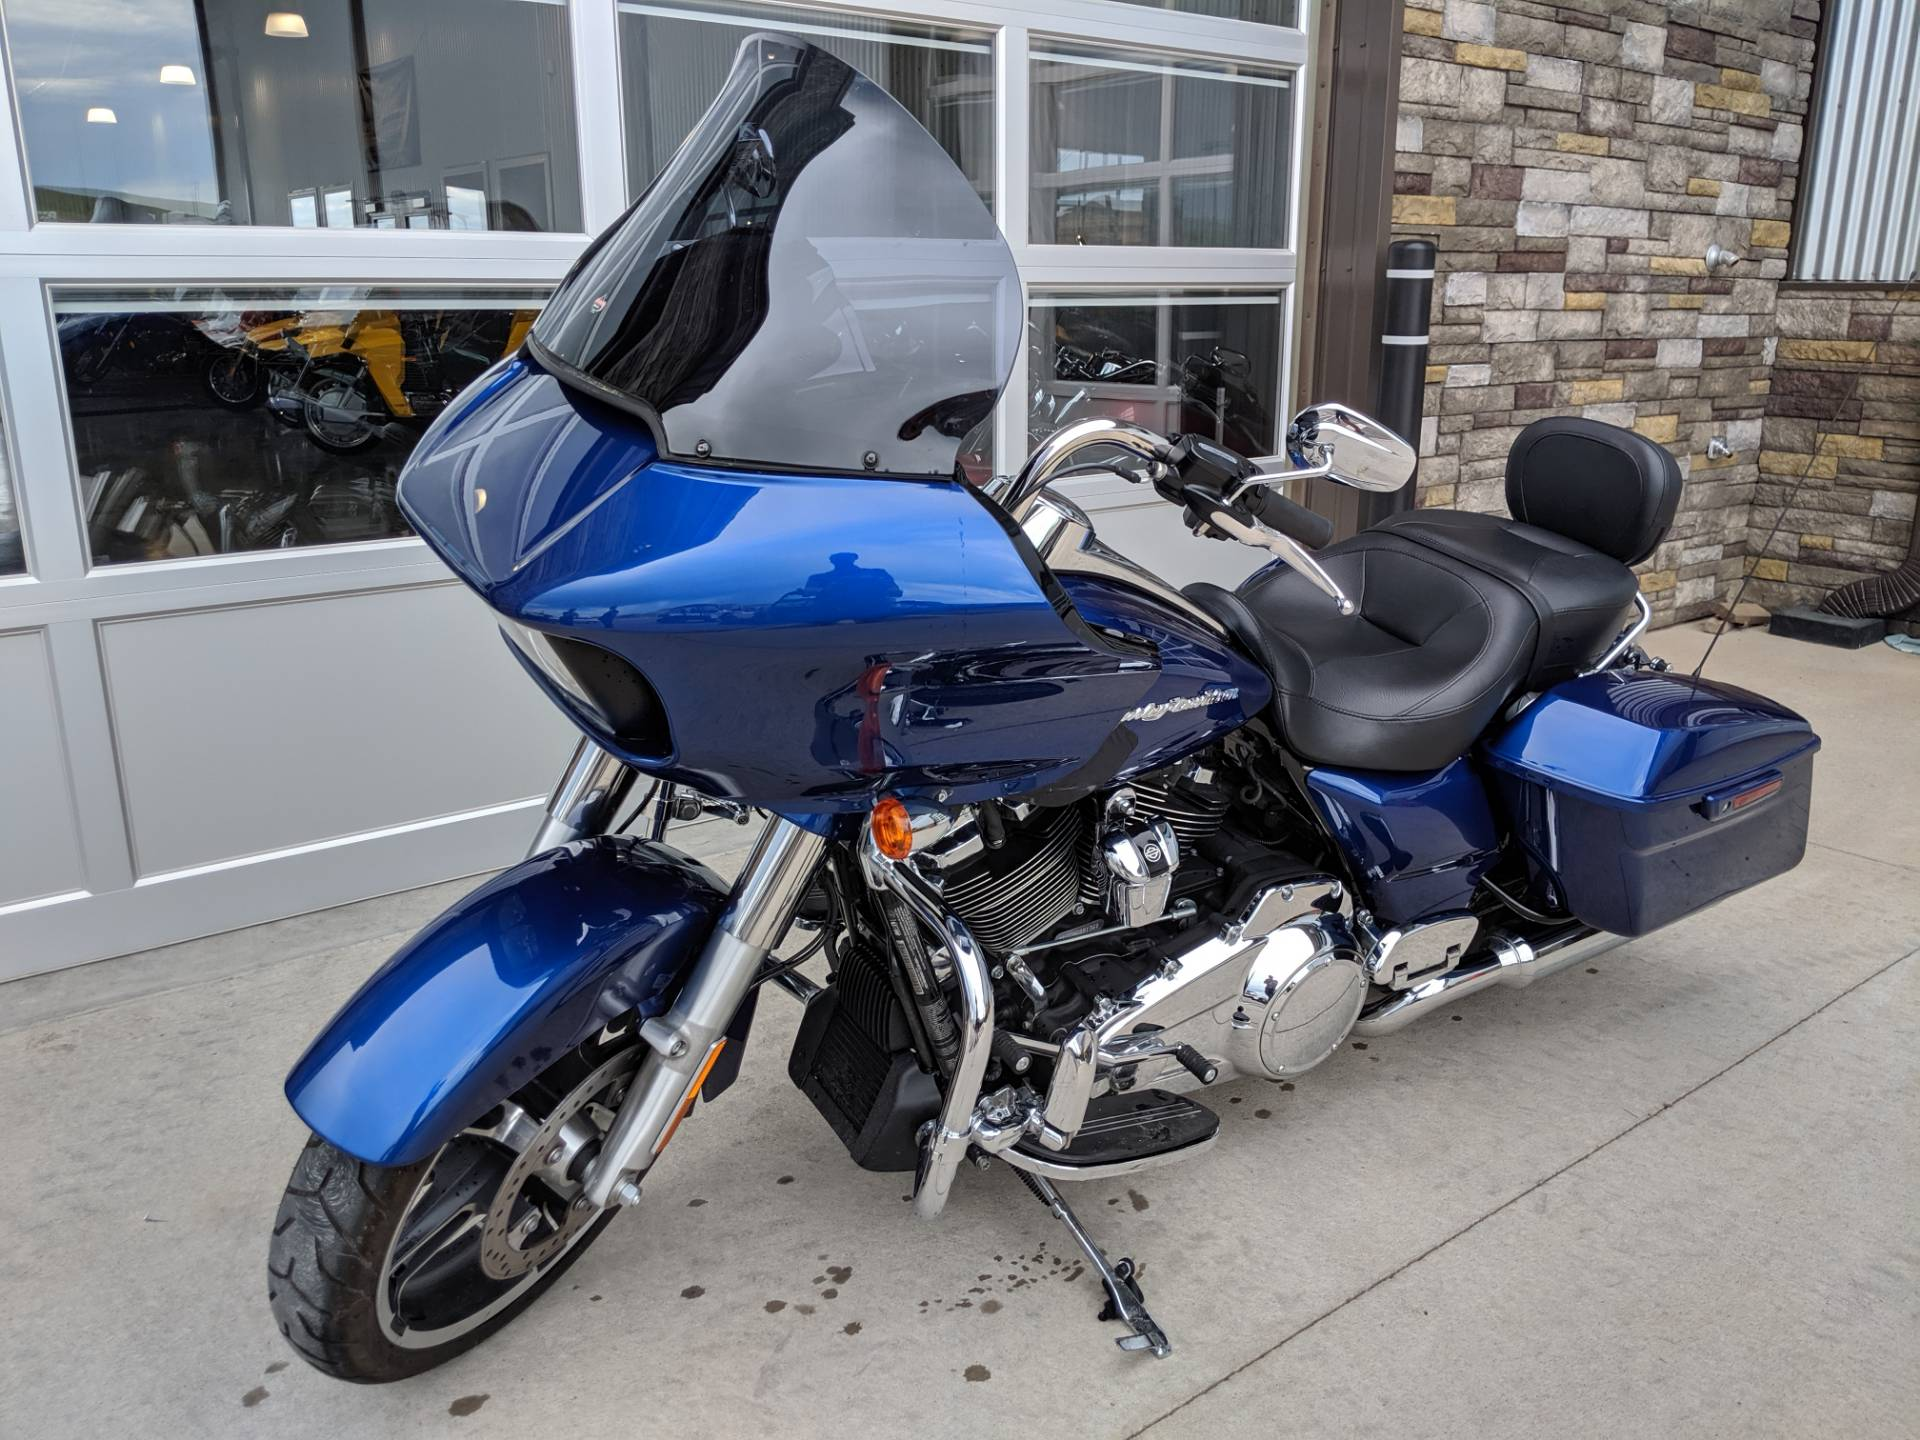 2017 Harley-Davidson Road Glide® Special in Rapid City, South Dakota